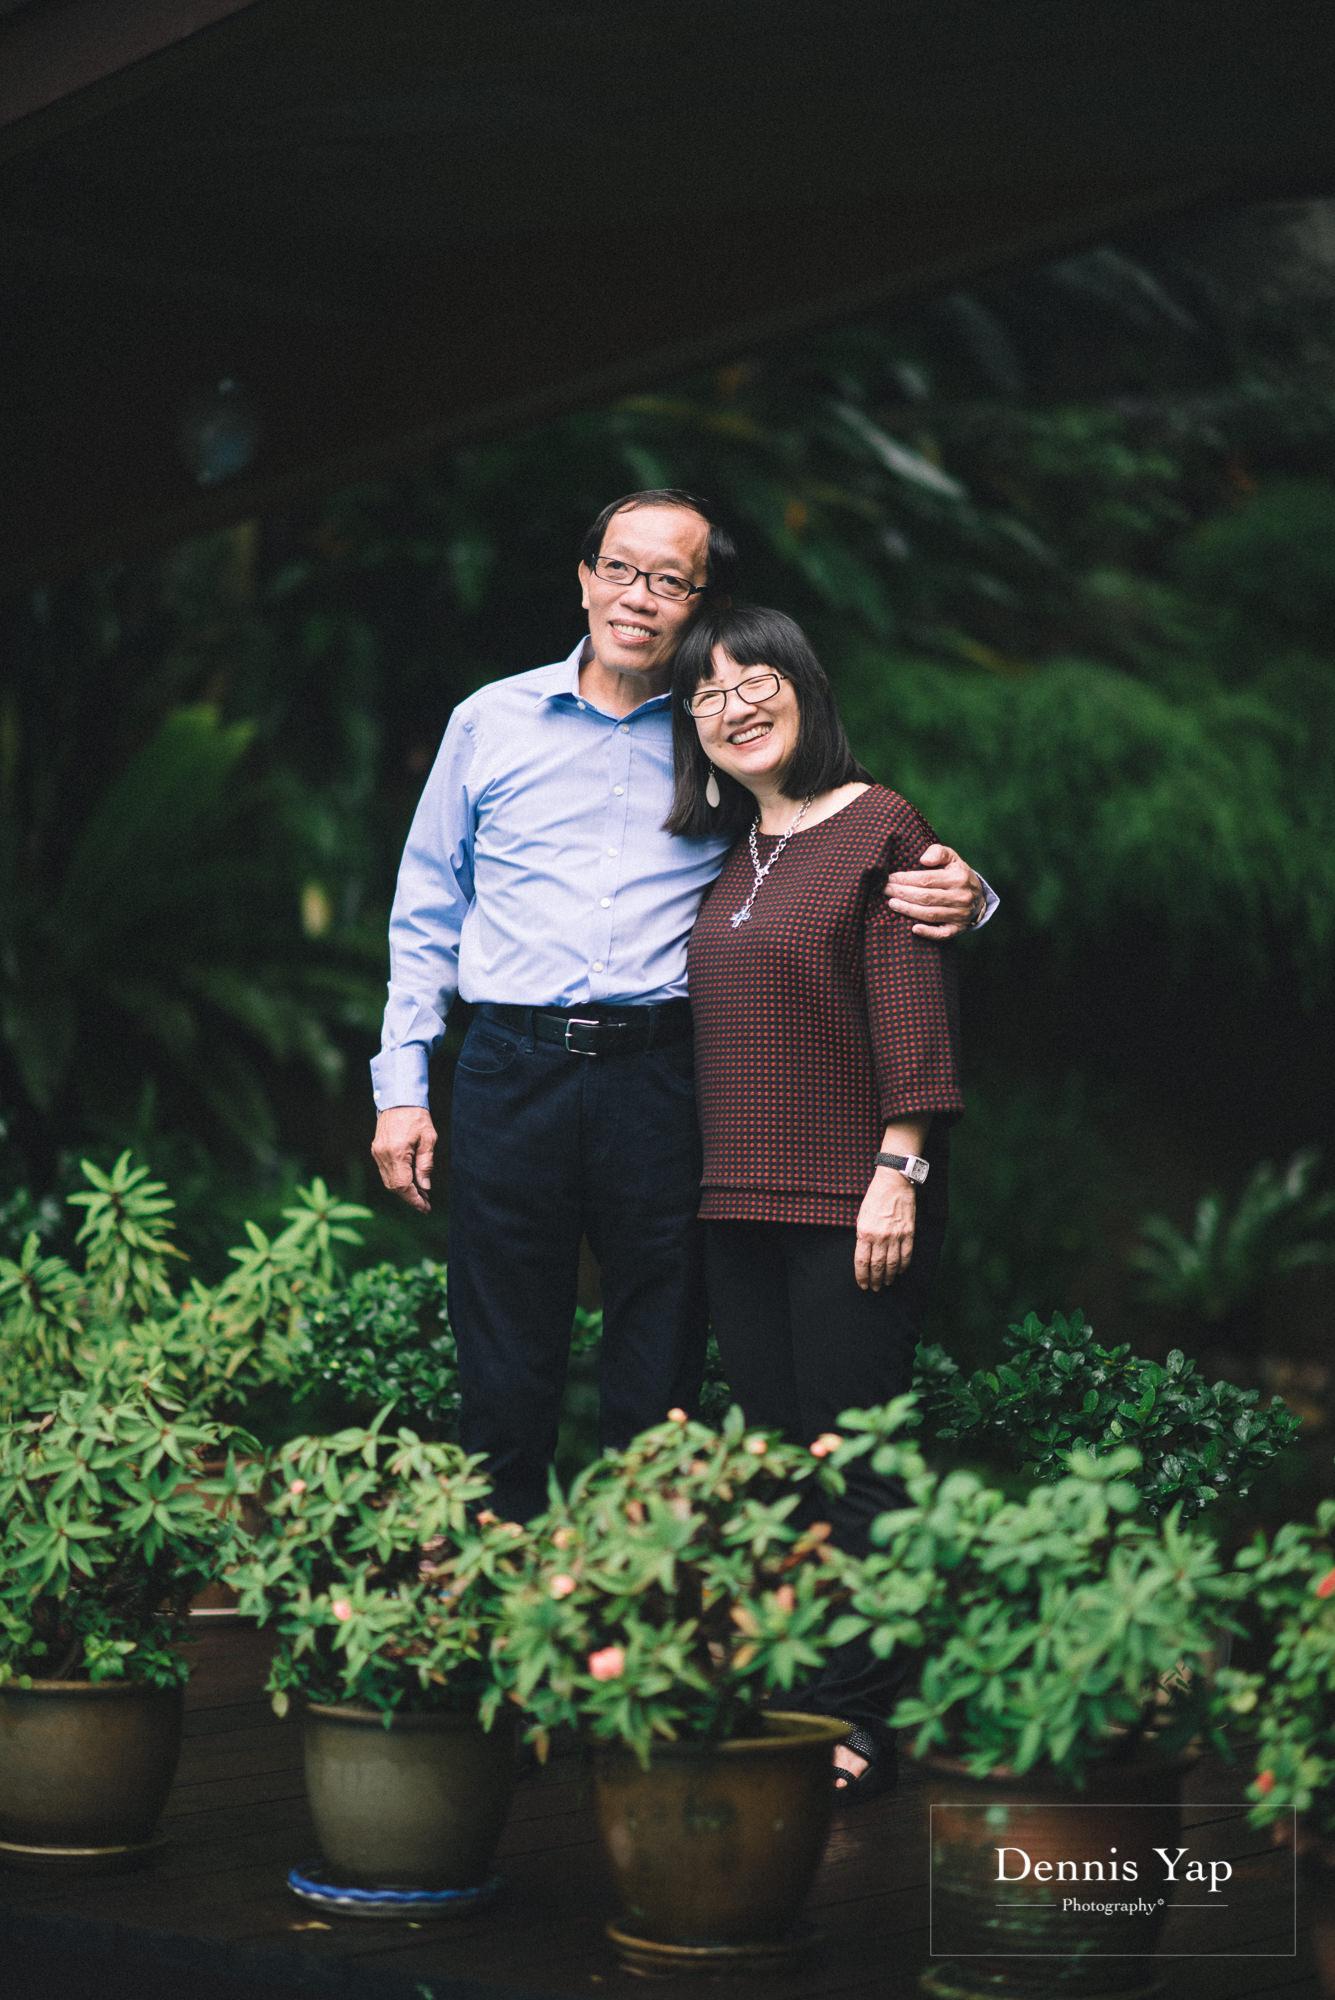 thong family chuen thong portrait beloved dennis yap photography-1.jpg